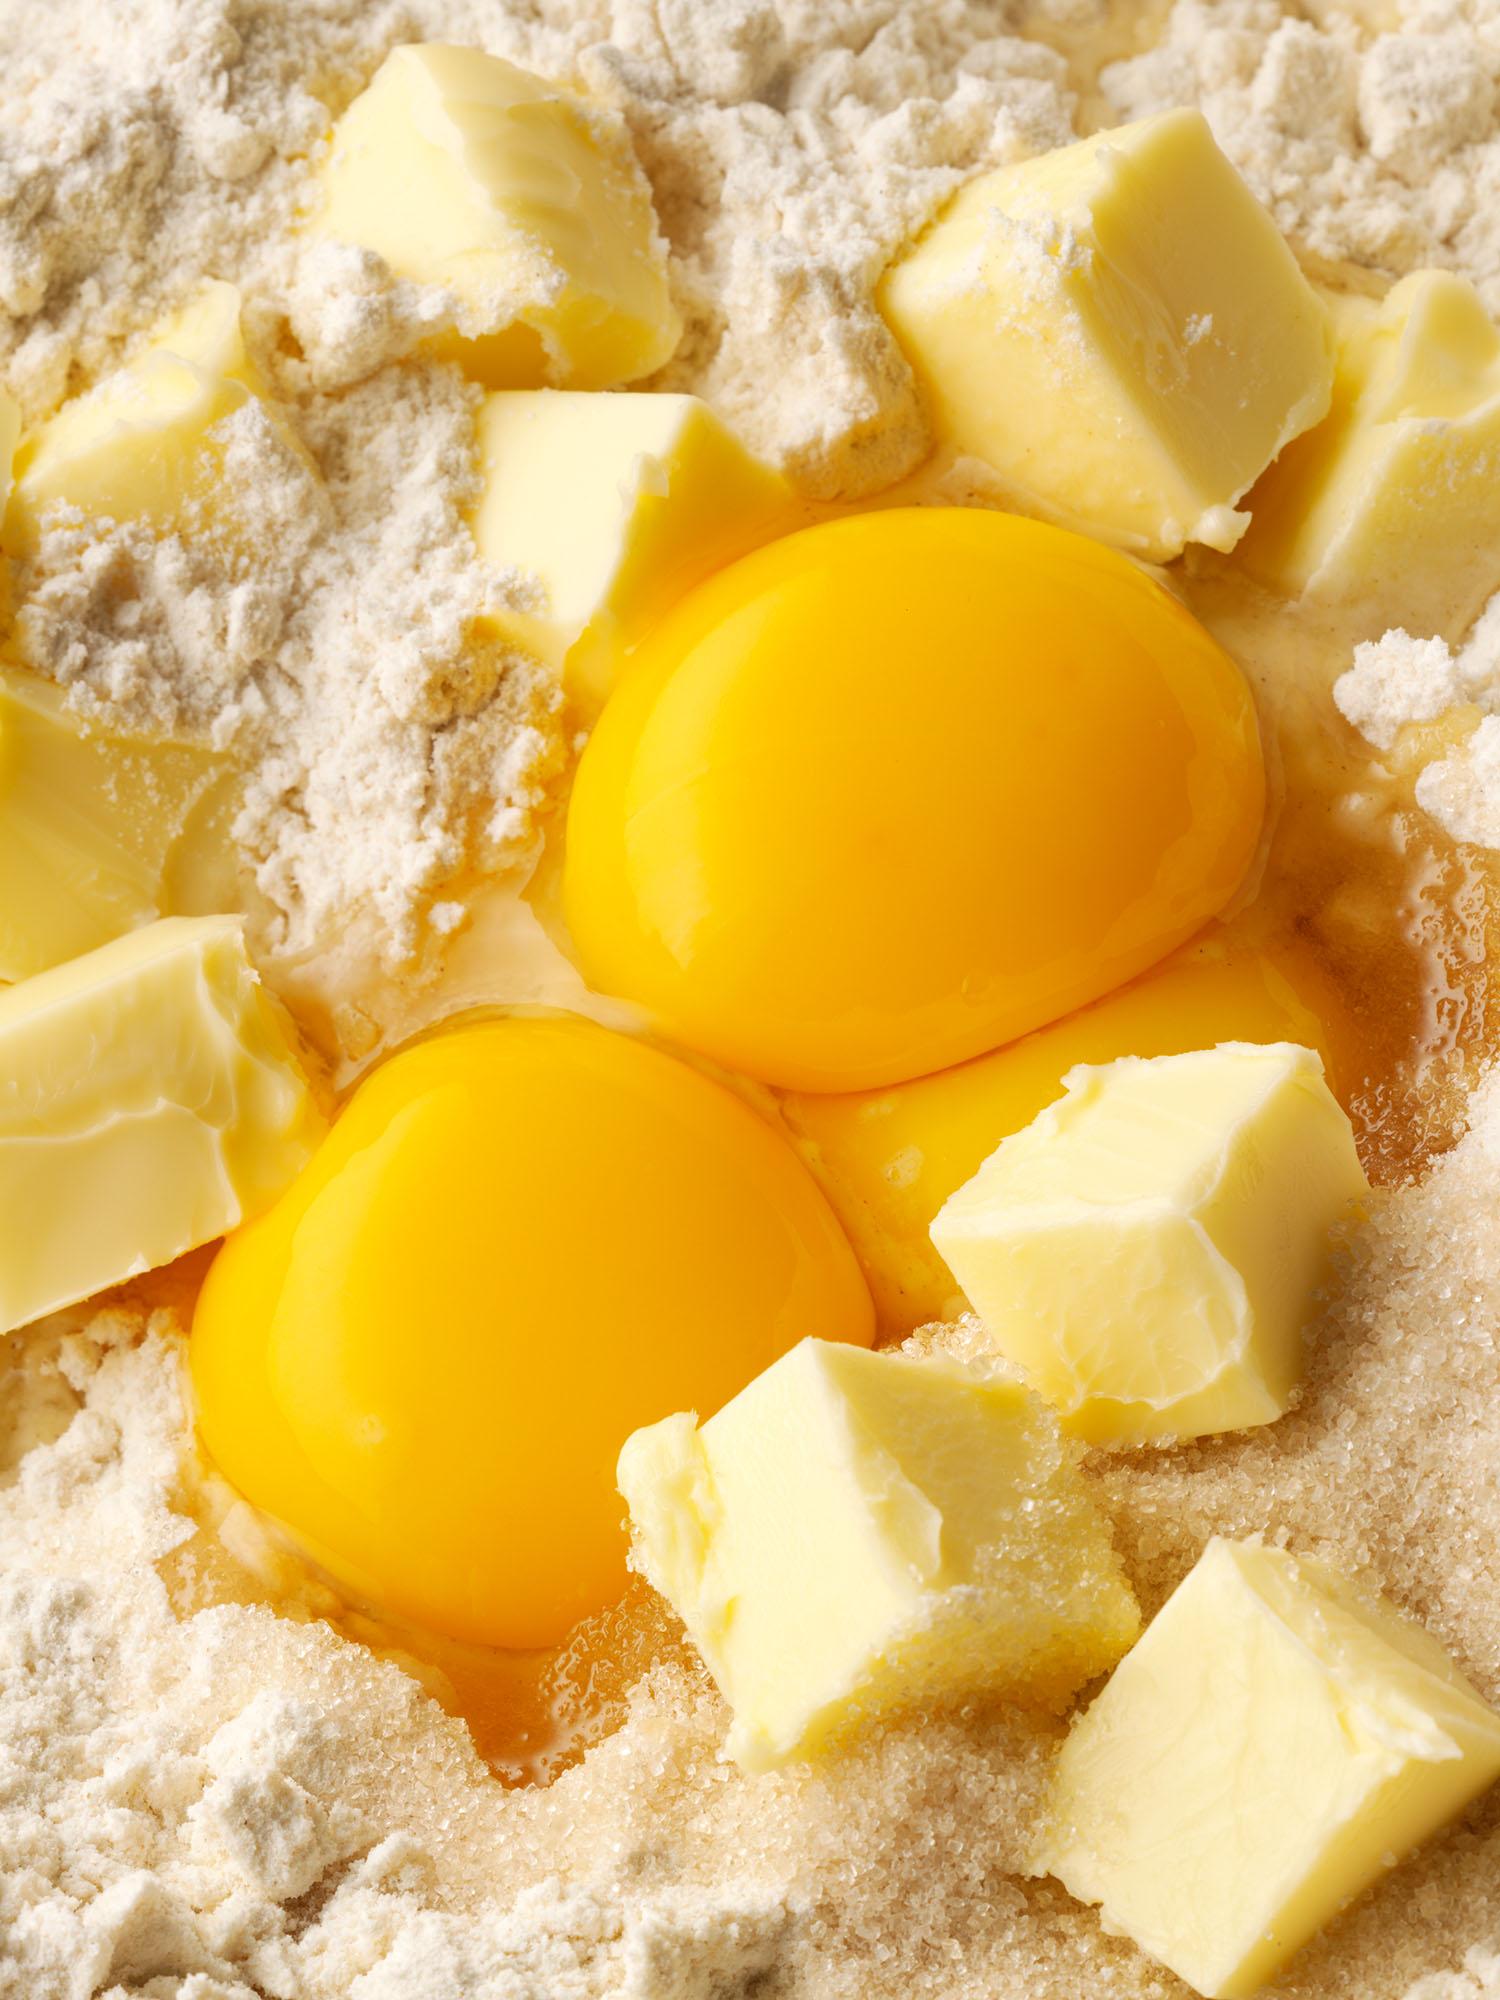 Food Photography Photographer London UK Egg Butter Flour